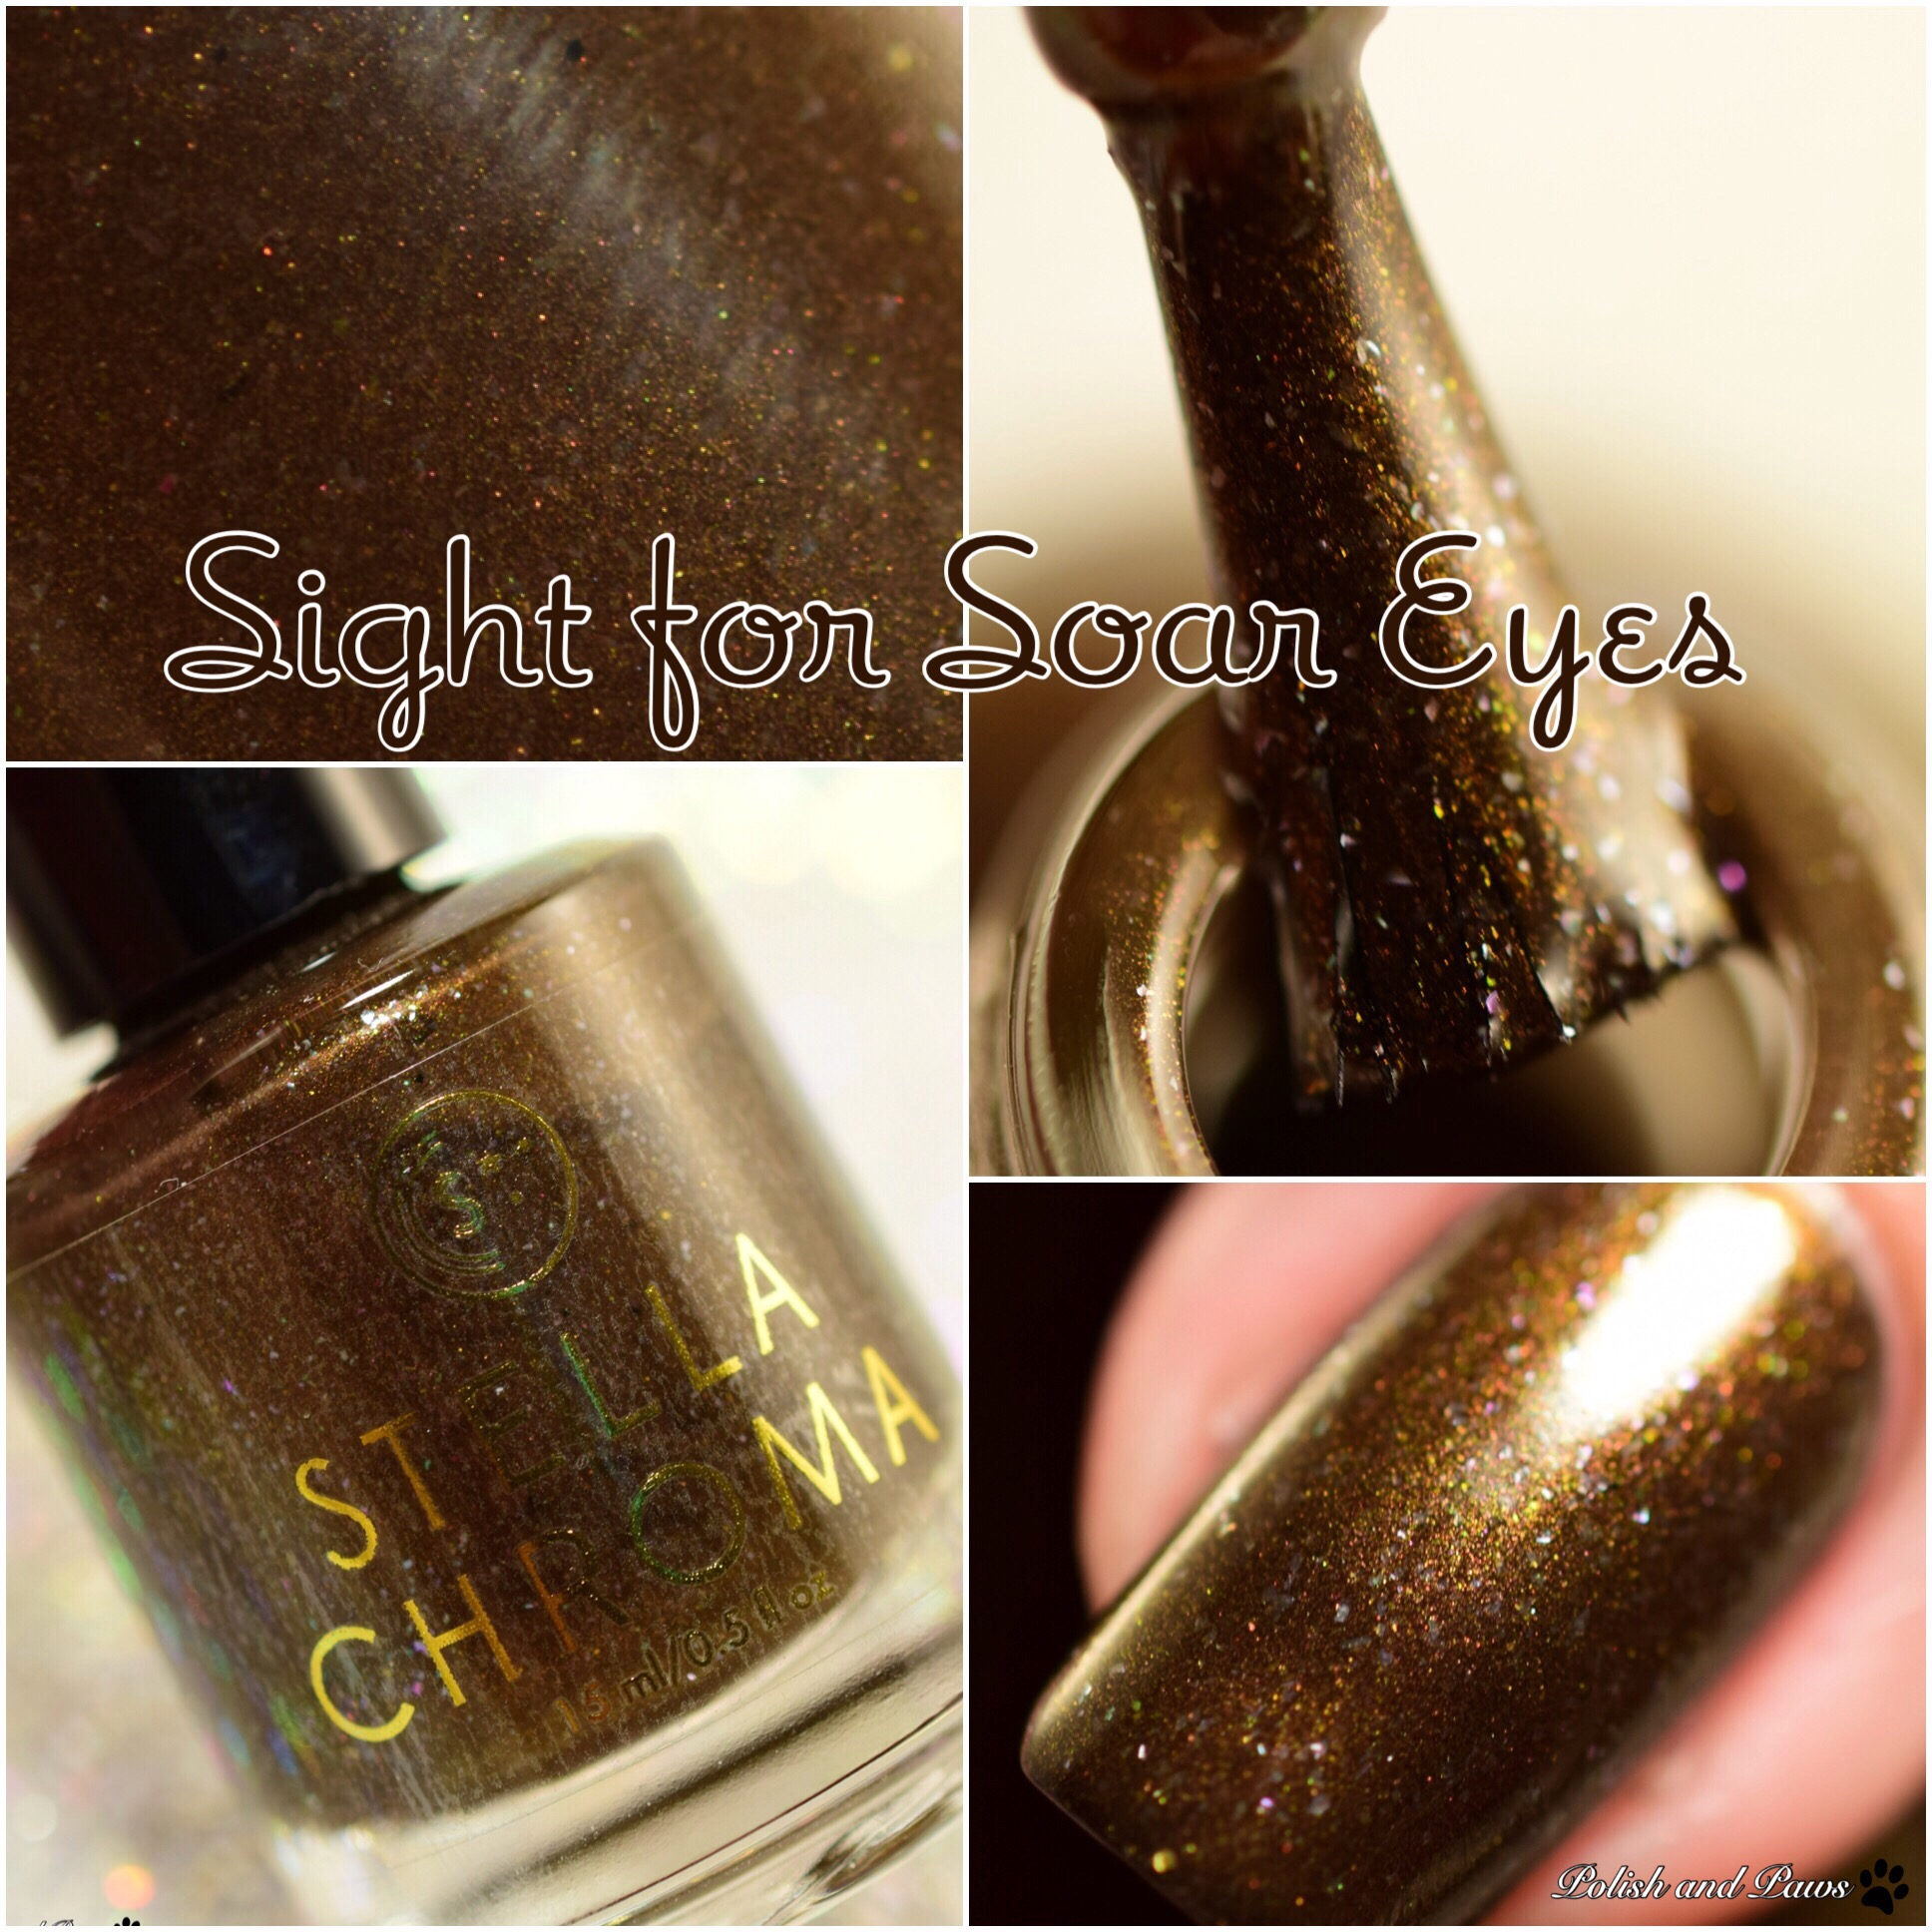 Stella Chroma Sight for Soar Eyes